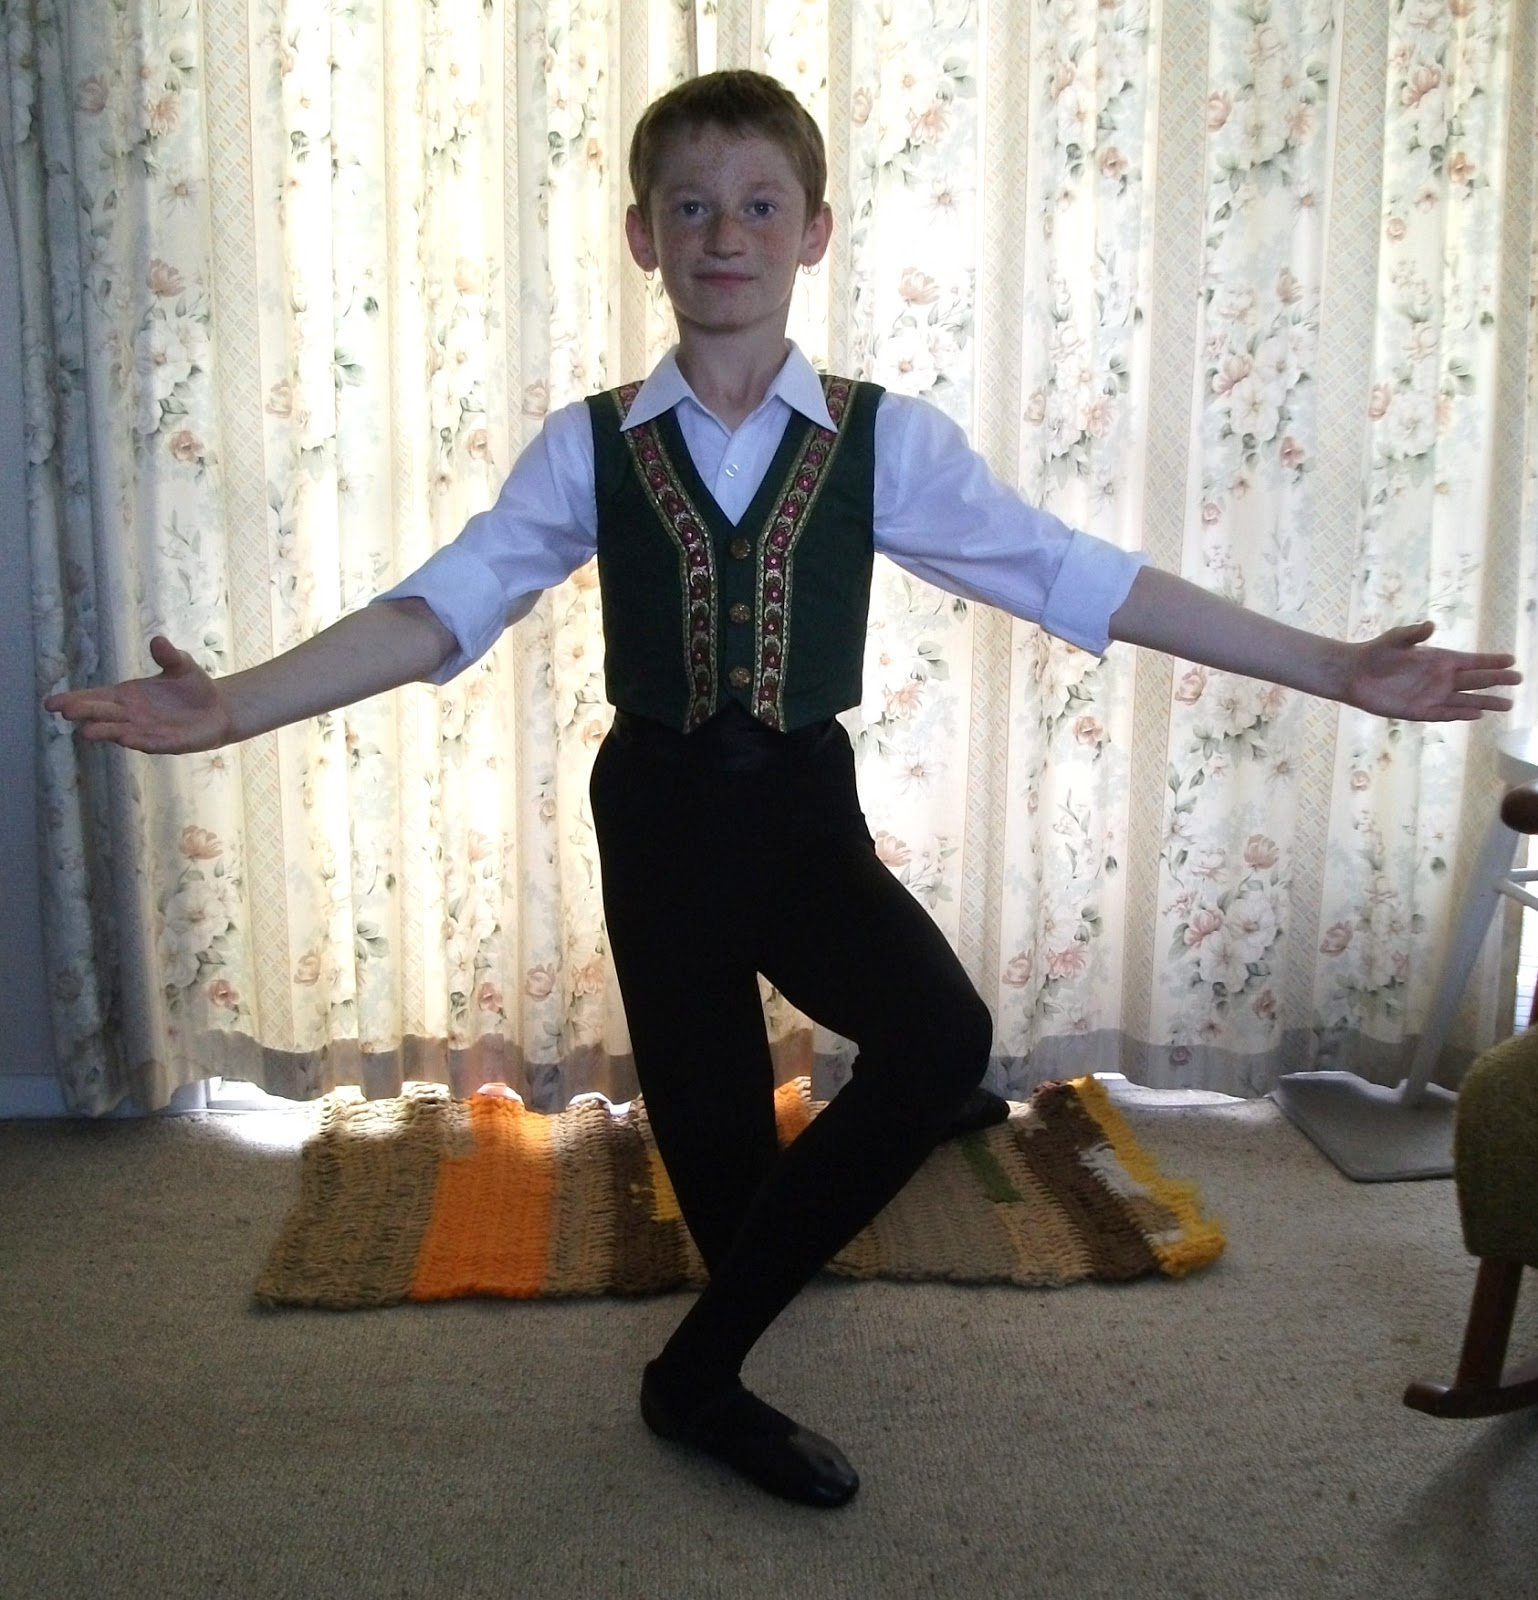 Costume Check  sc 1 st  Ballet Boy New Zealand & Ballet Boy New Zealand: Costume Check